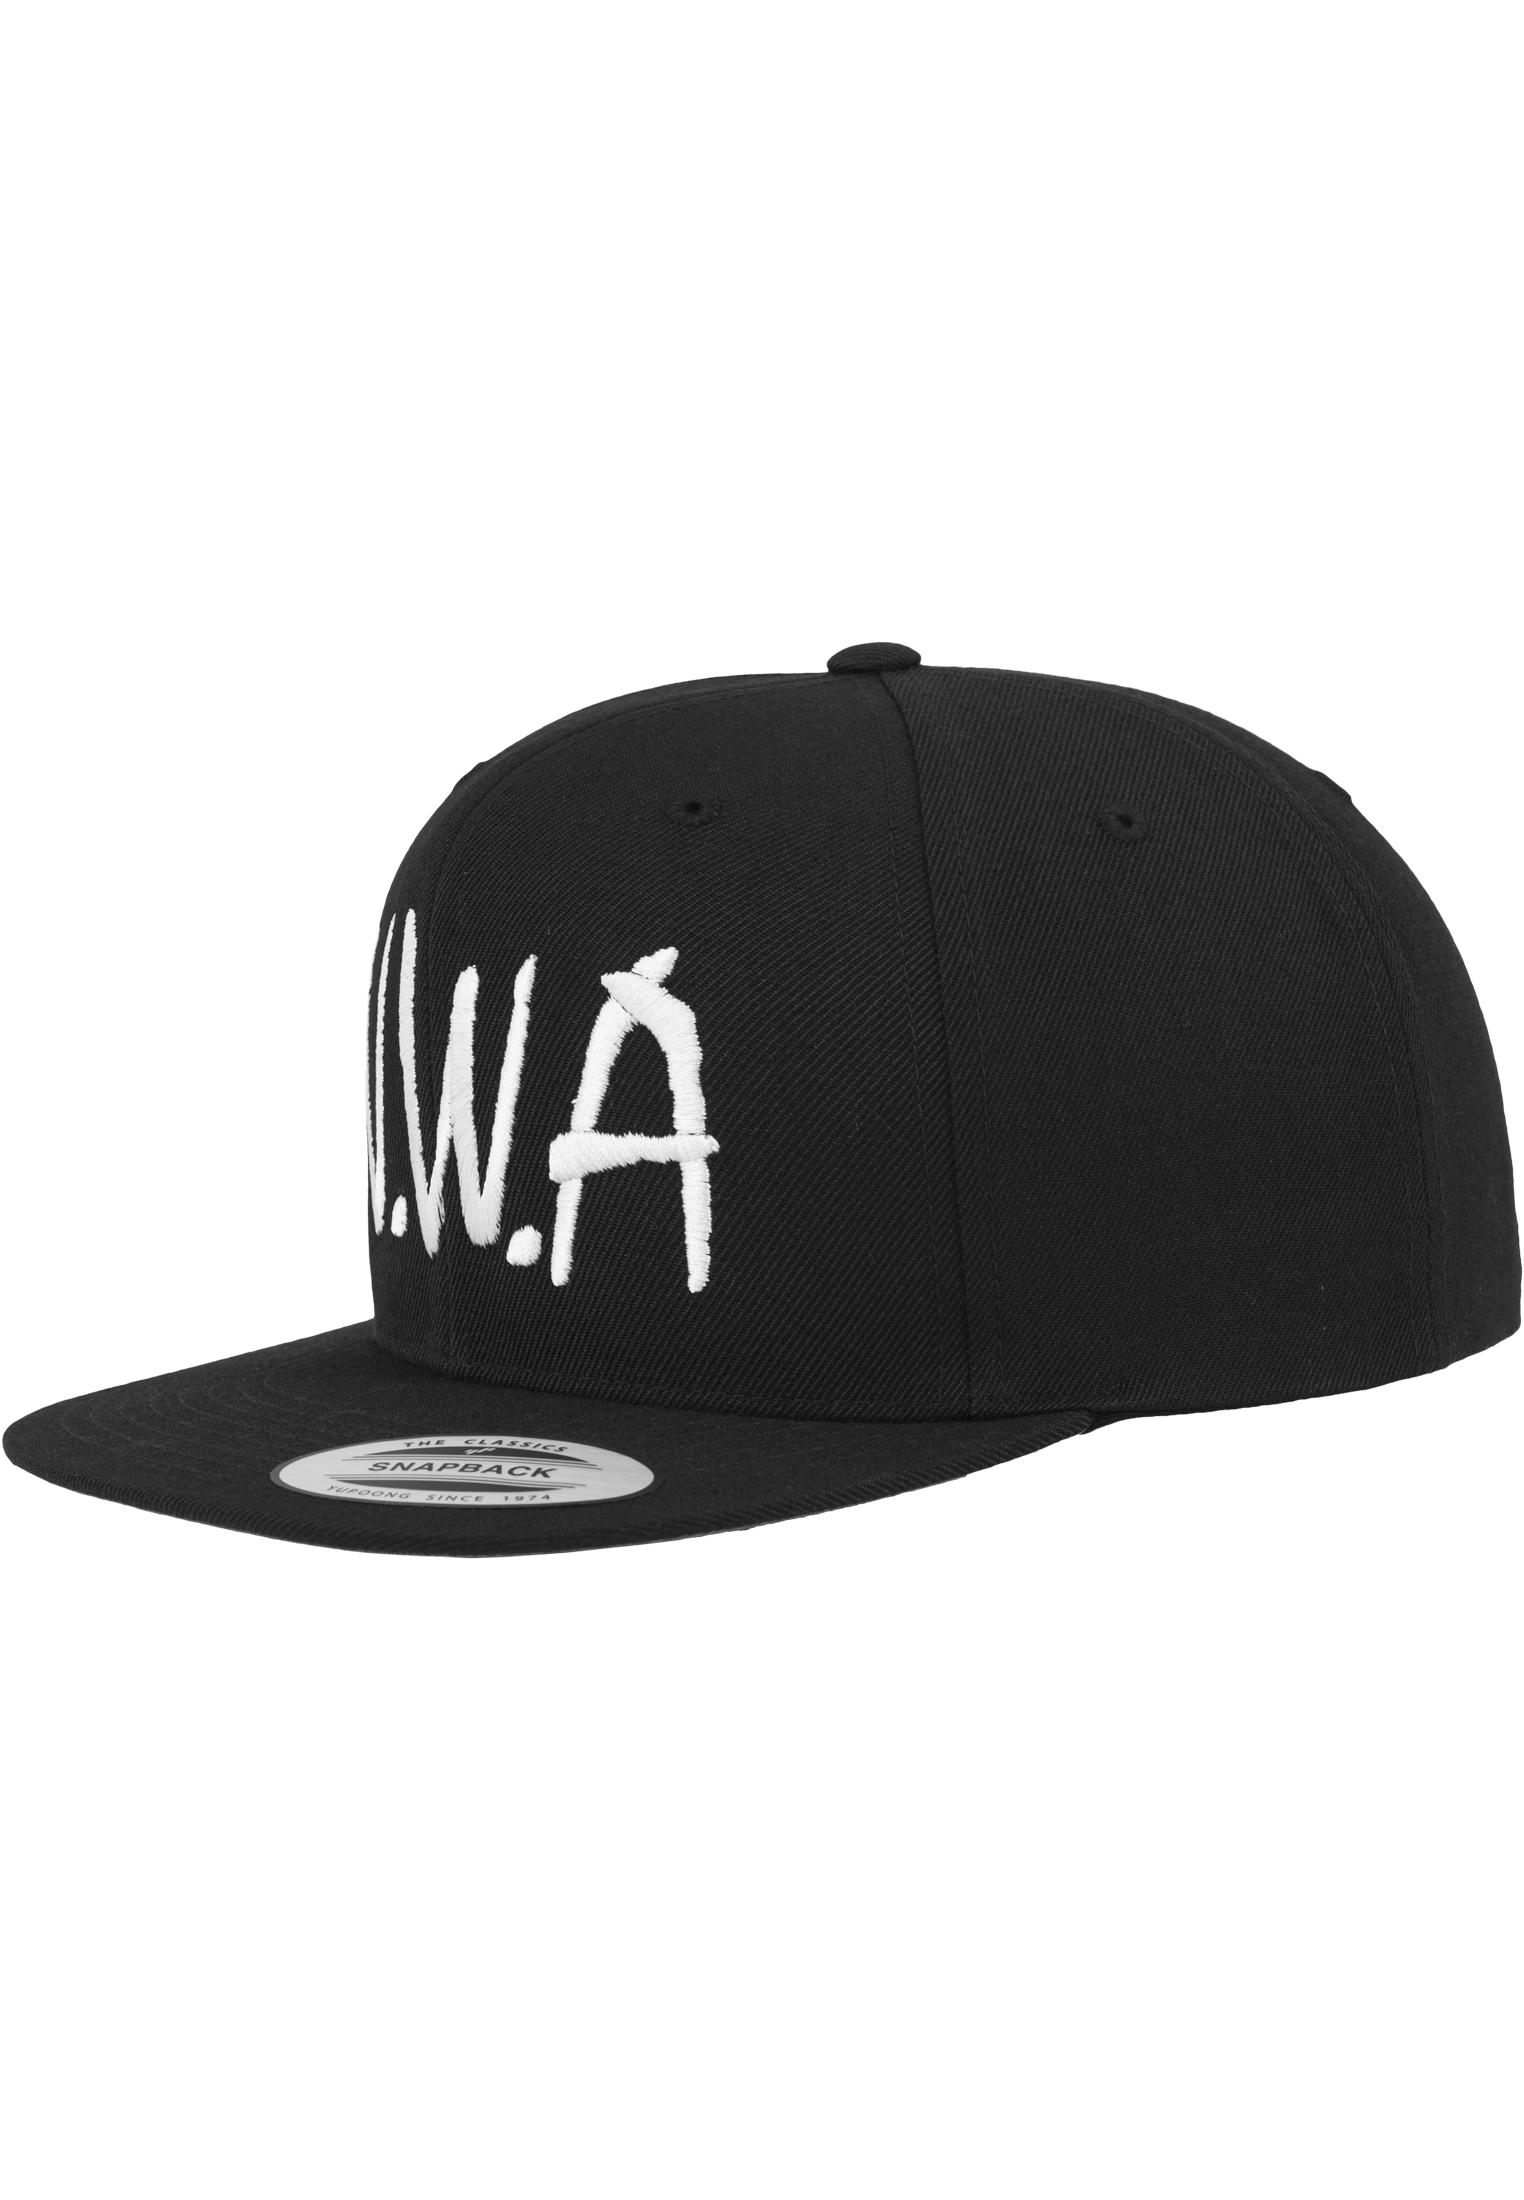 N.W.A keps Snapback